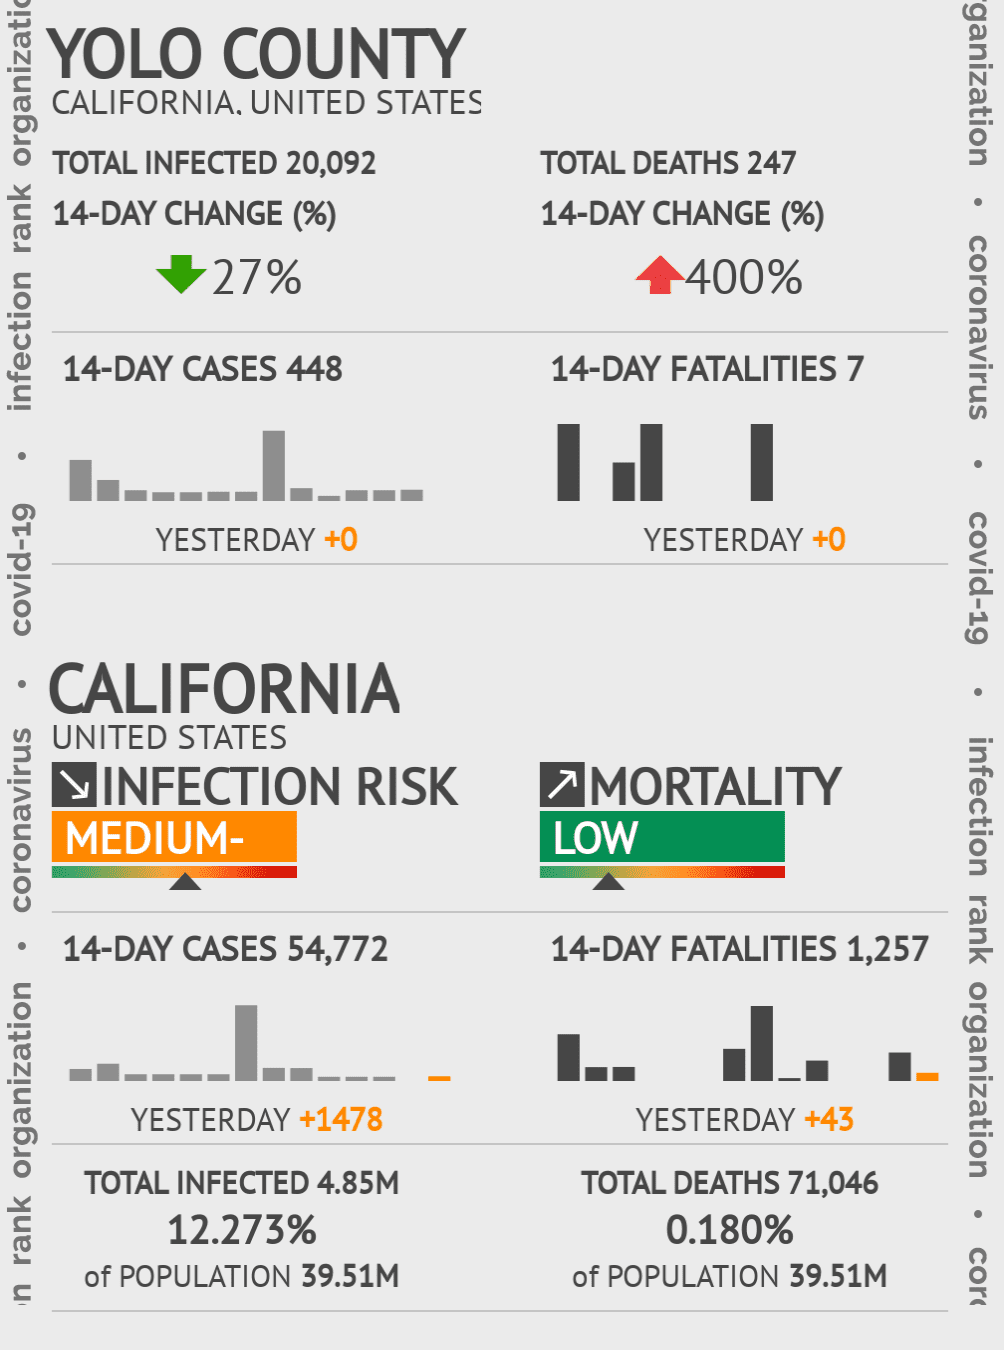 Yolo County Coronavirus Covid-19 Risk of Infection on October 29, 2020